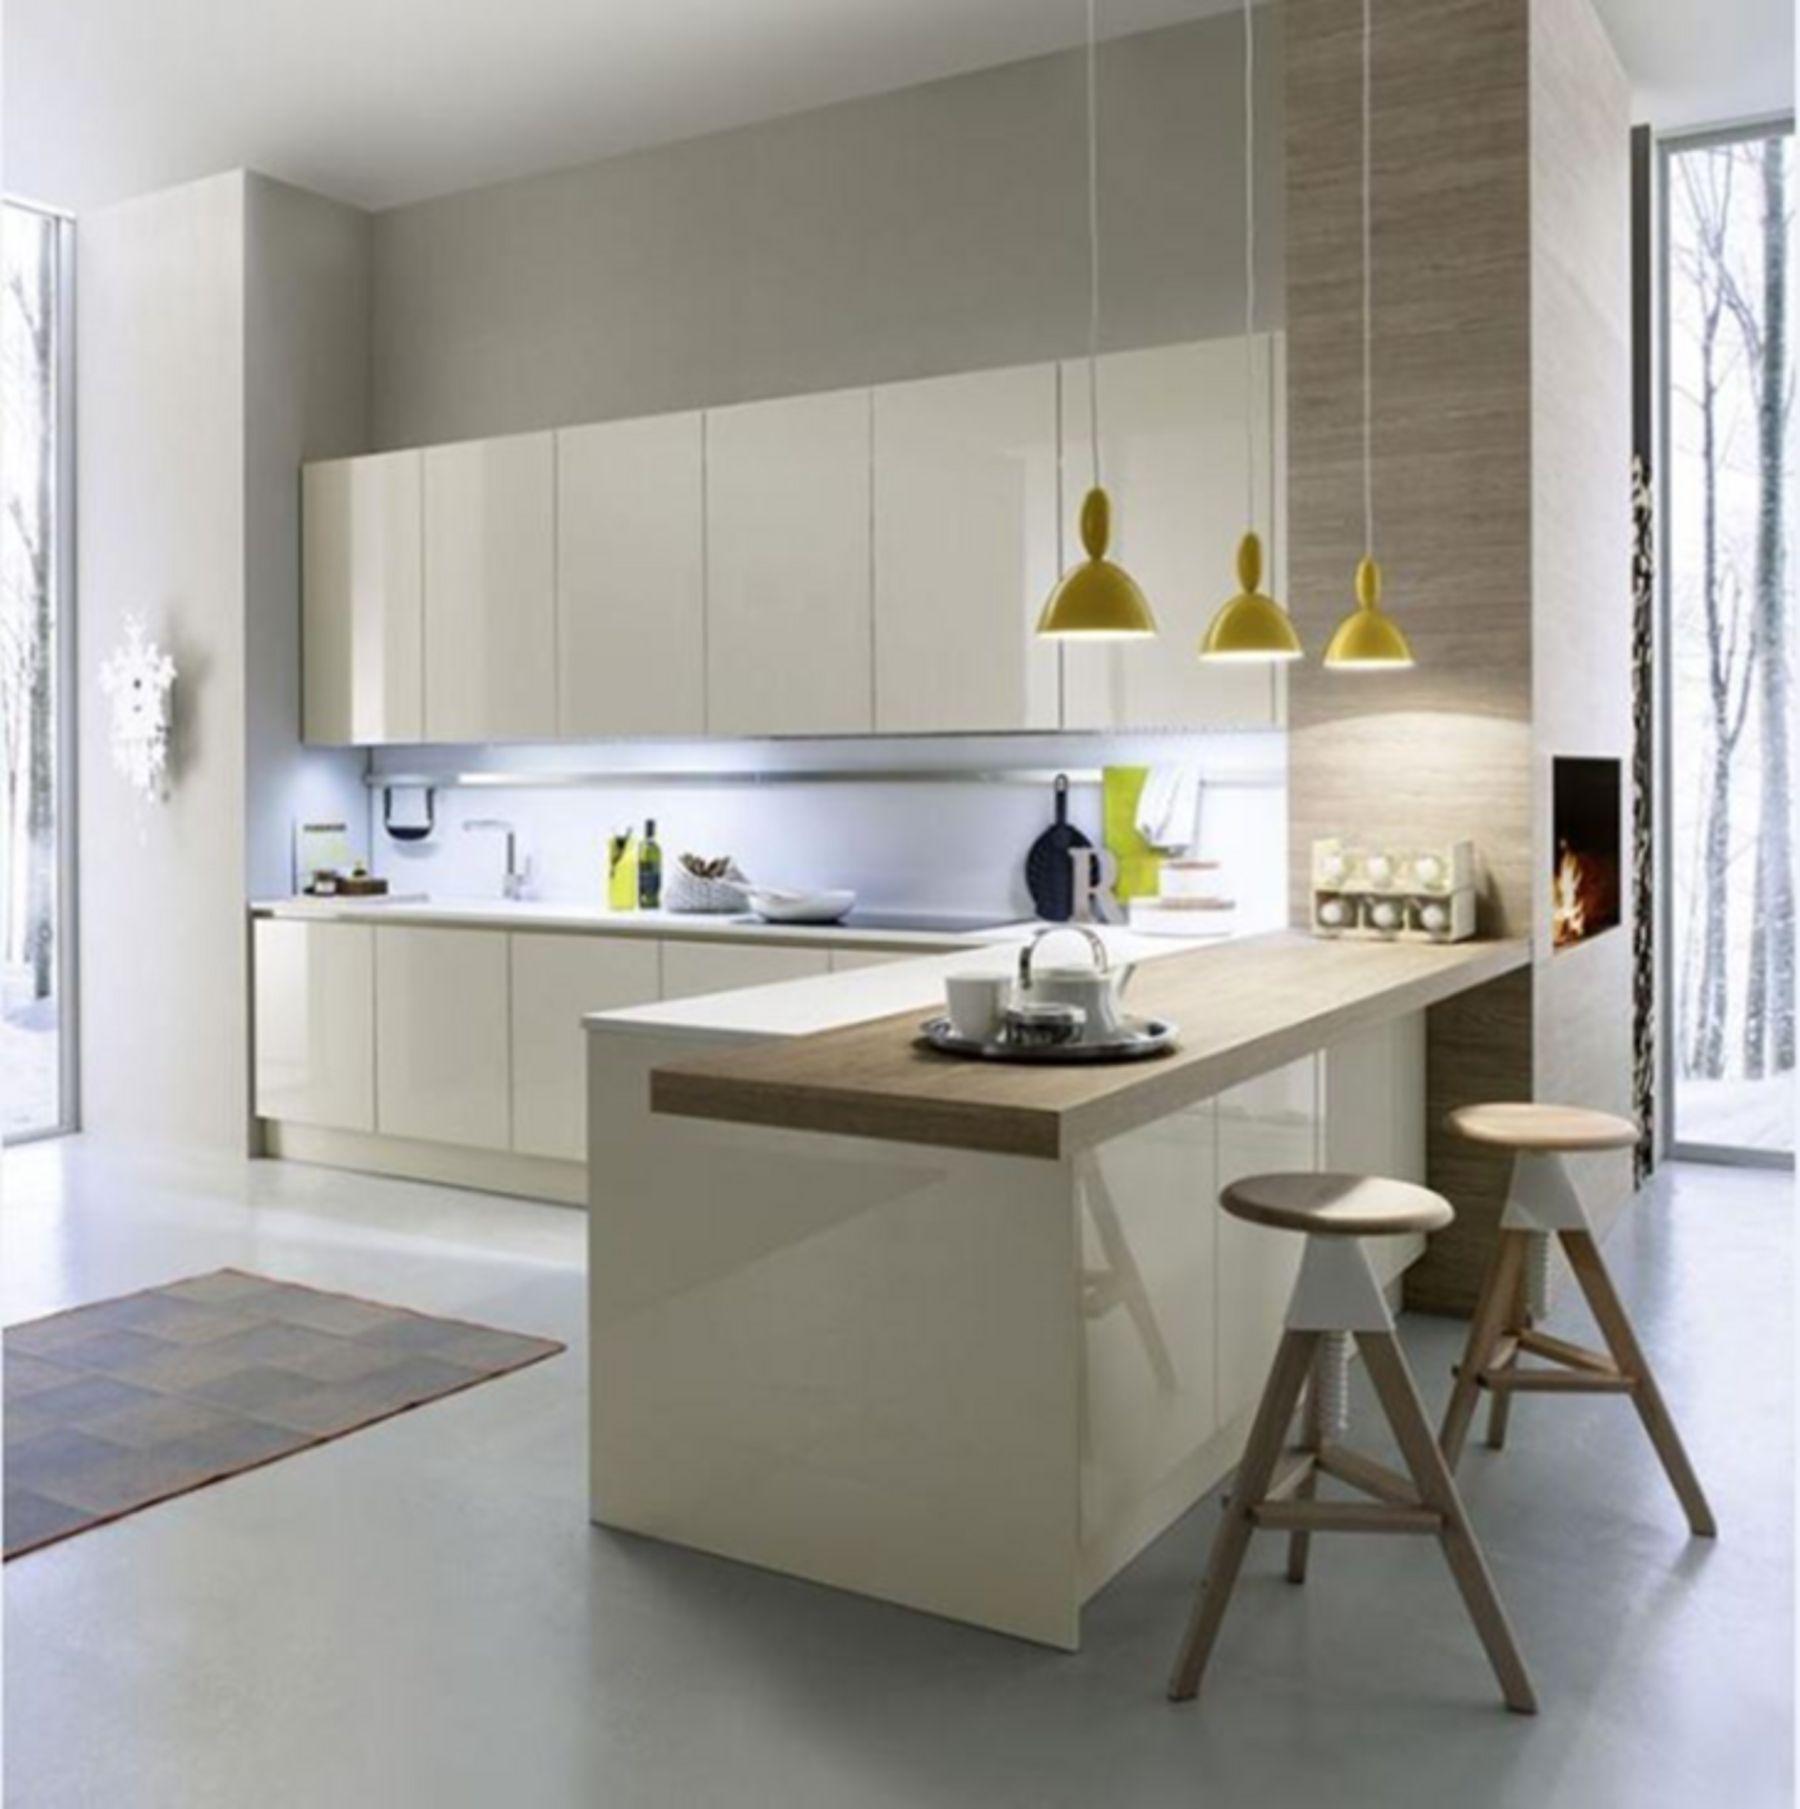 Interesting 10 Minimalist Kitchen Set Design Ideas For Your Minimalist Home Simple Kitchen Design Elegant Kitchen Design Minimal Kitchen Design